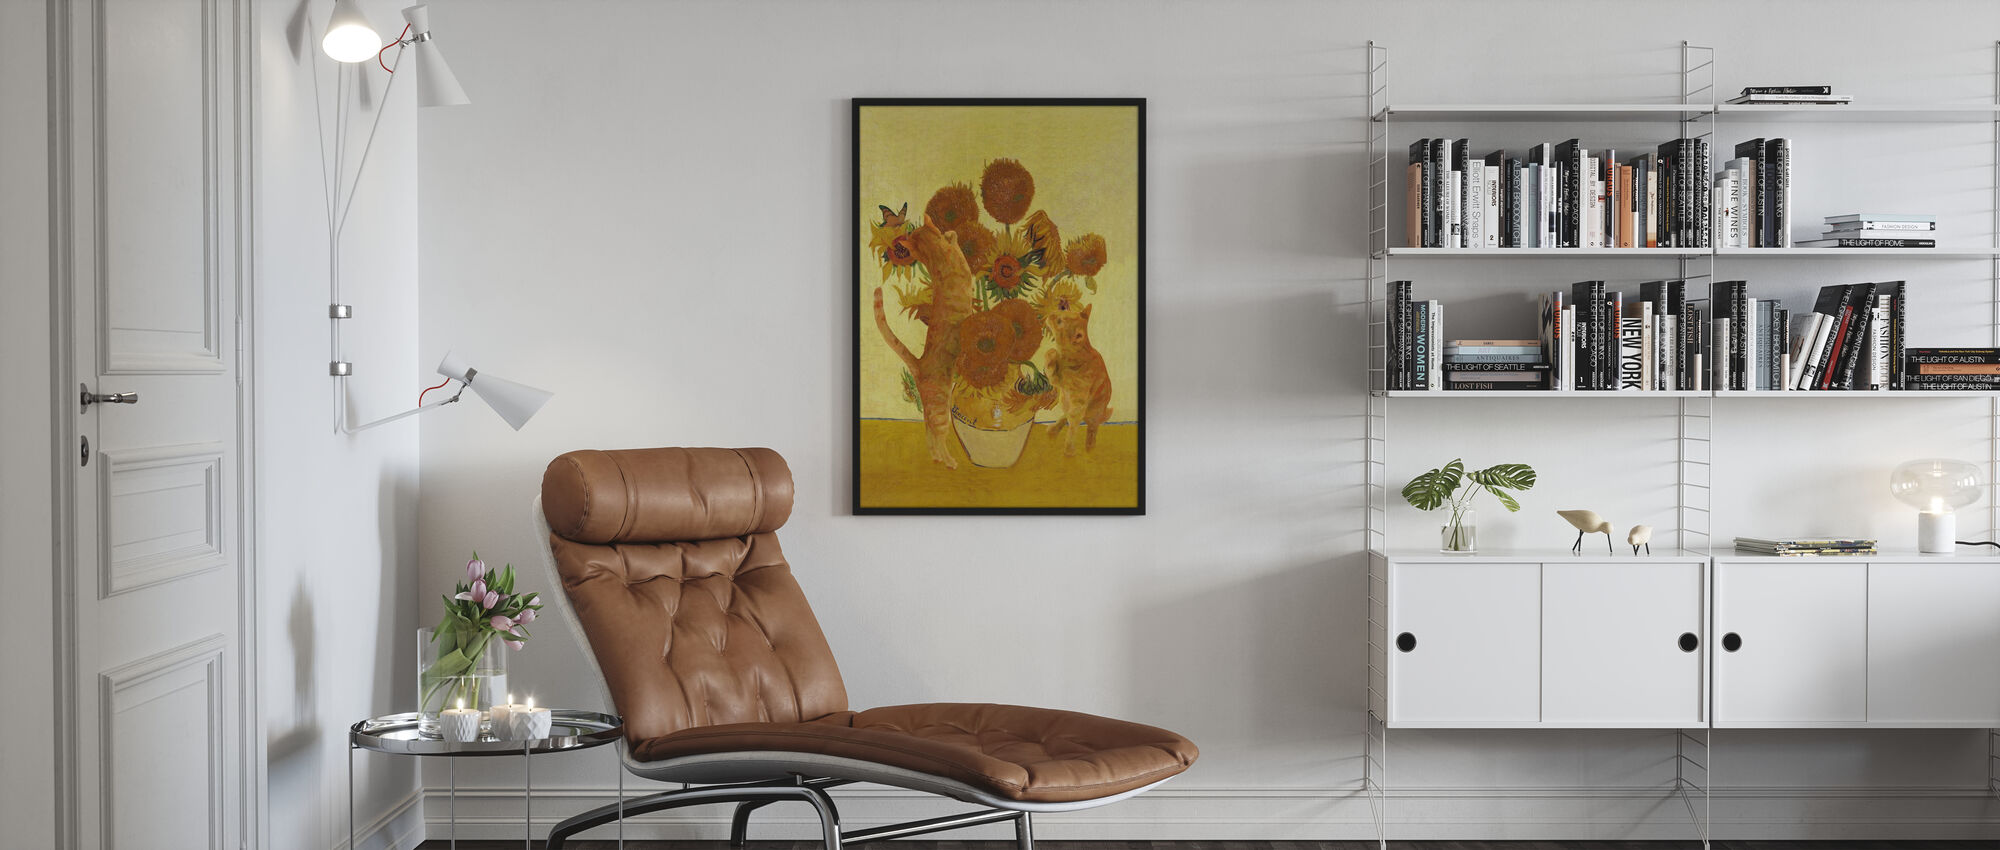 Vangogh Cats - Poster - Living Room